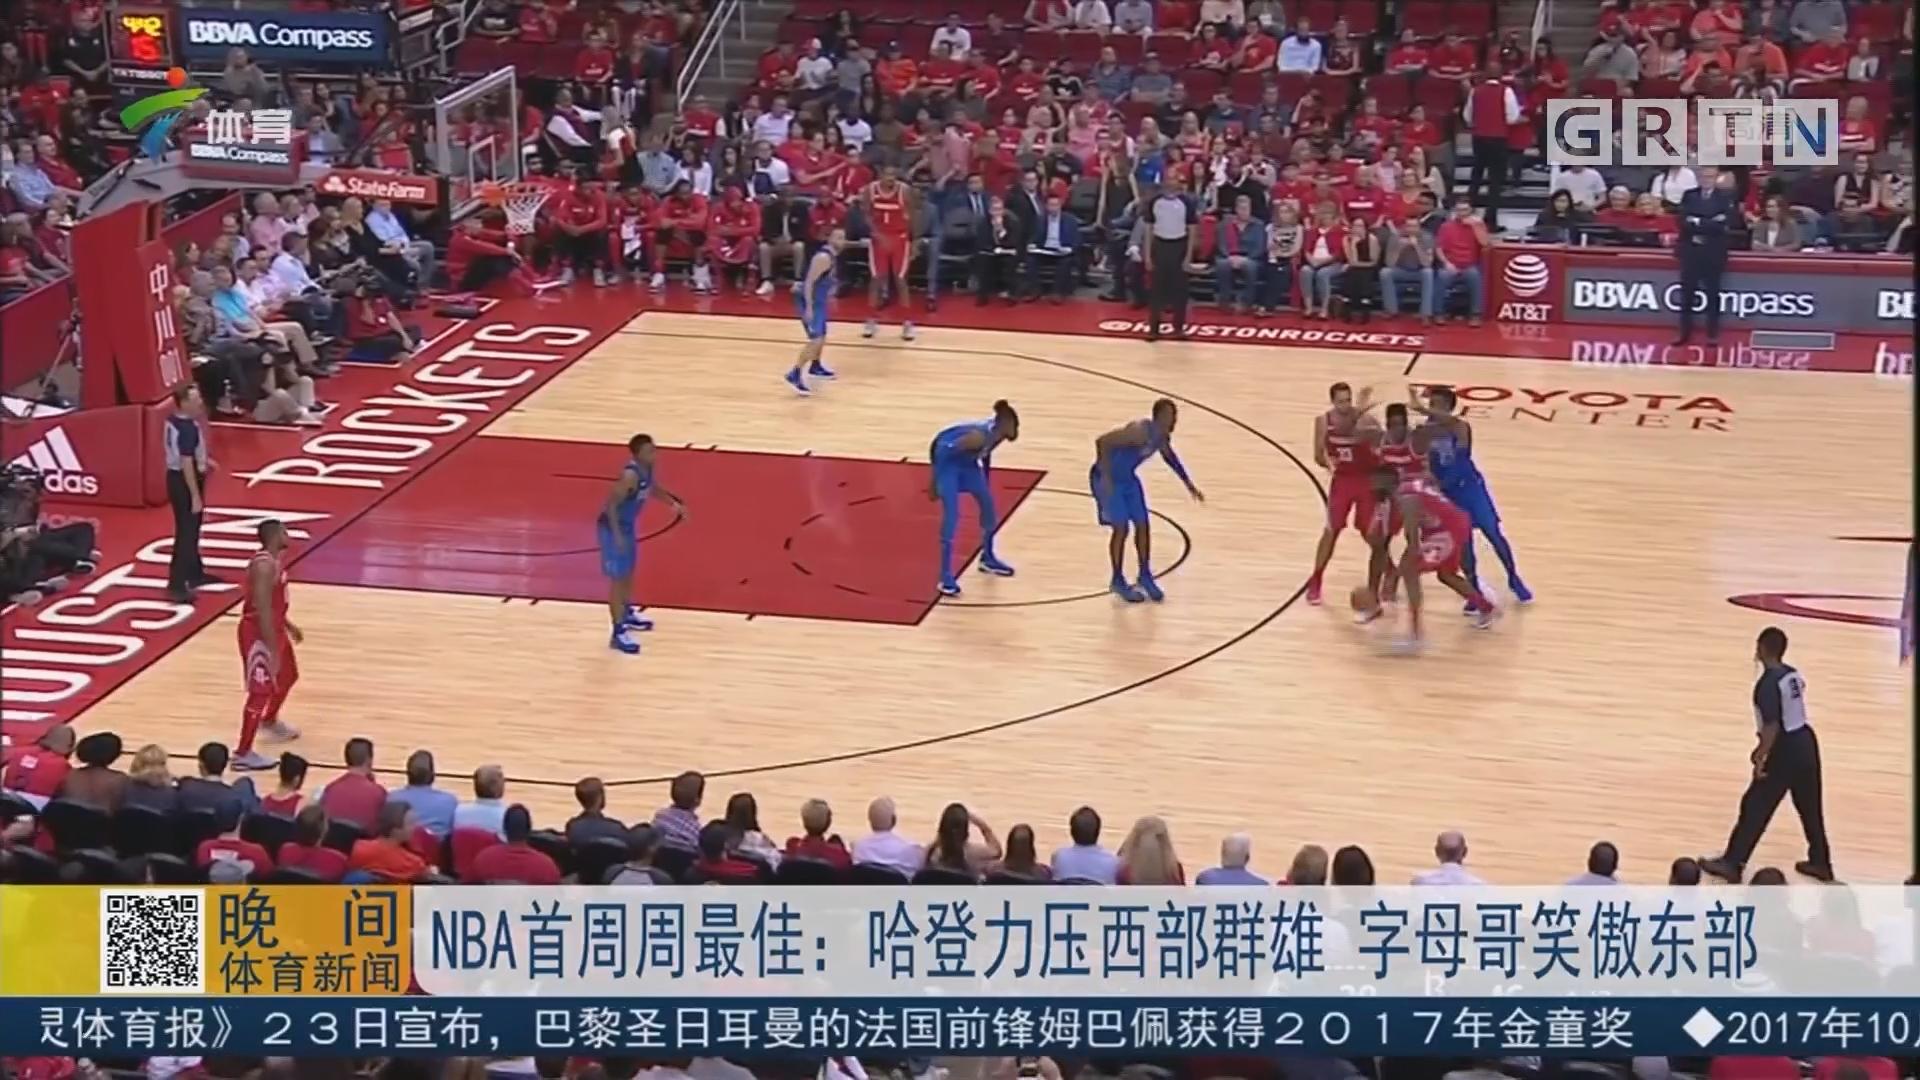 NBA首周周最佳:哈登力压西部群雄 字母哥笑傲东部